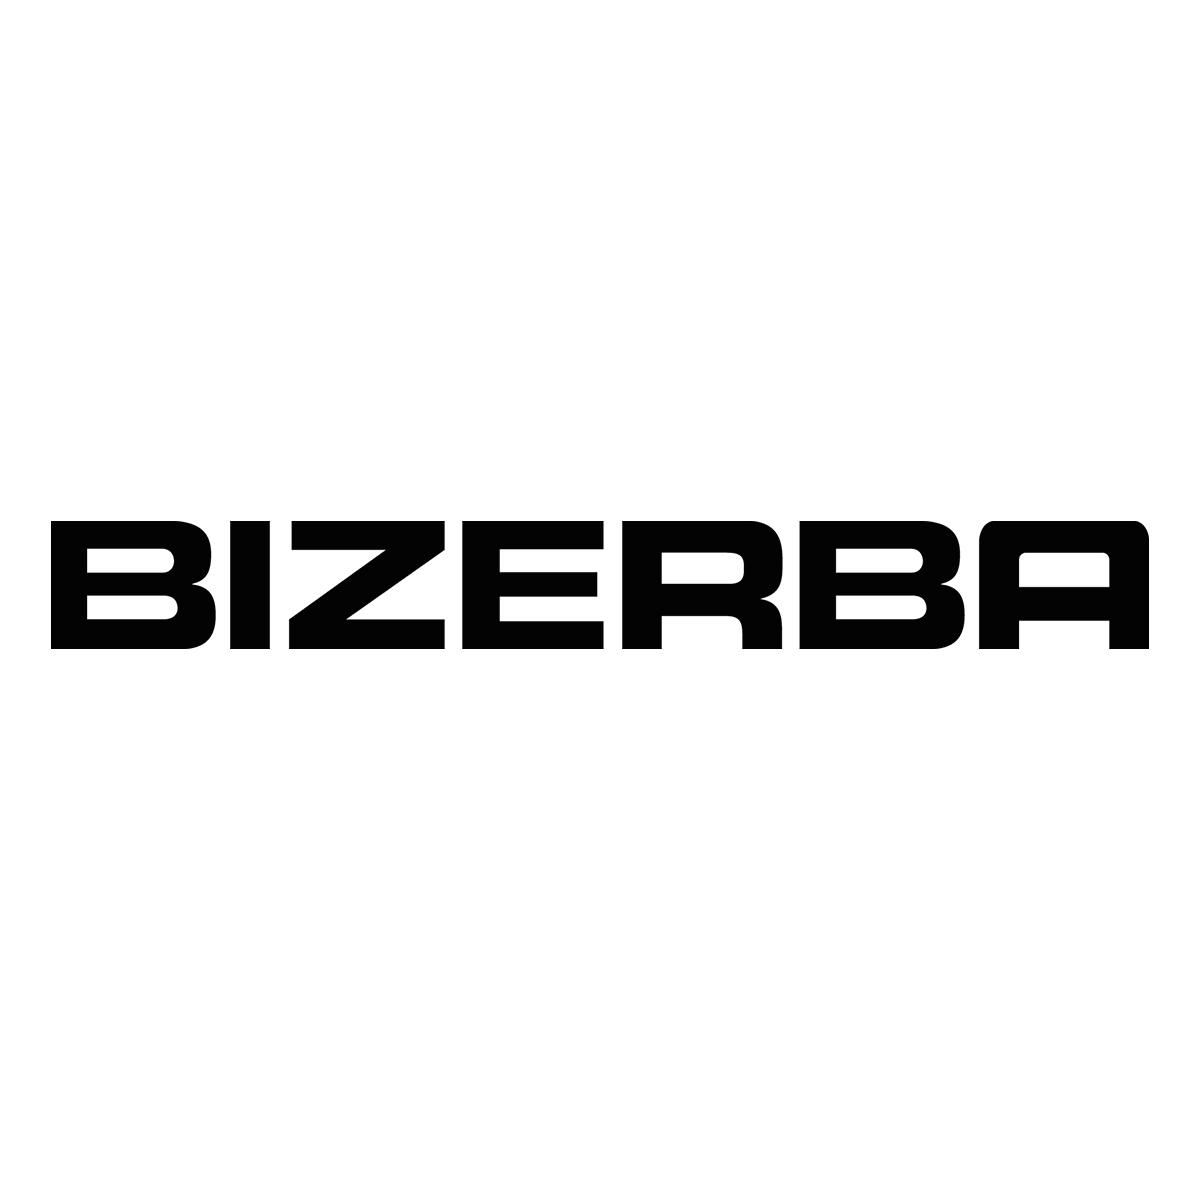 BIZERBA Ukraine